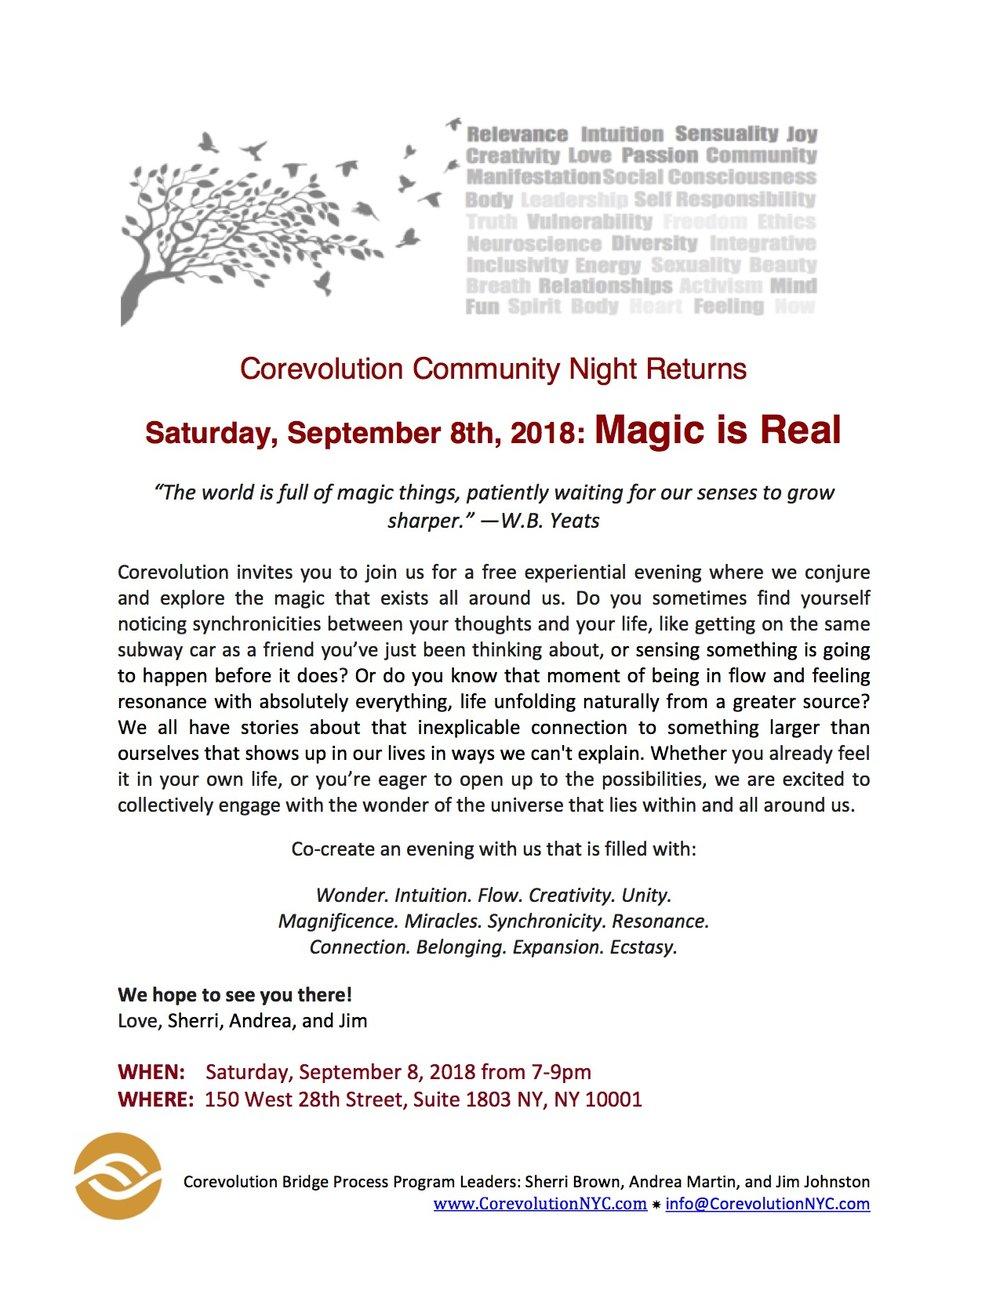 Magic Community Night flyer 9_8_18.jpg